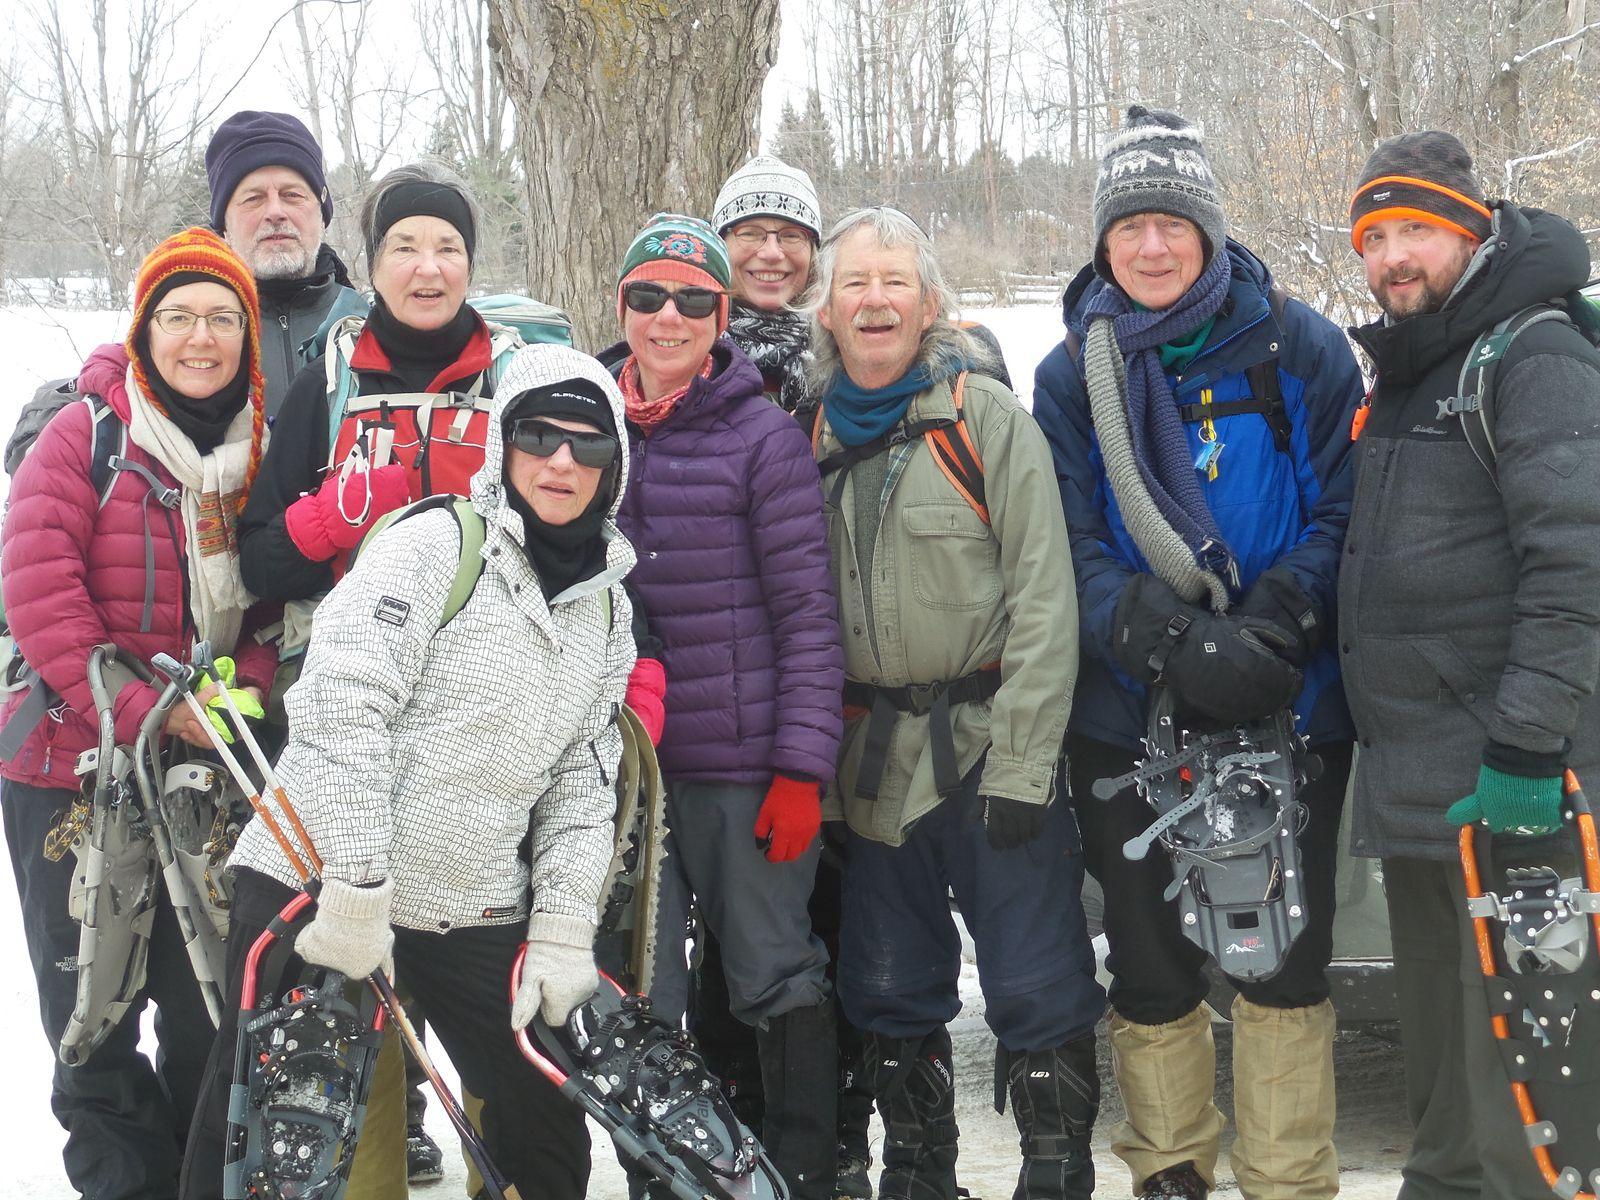 Bravo aux 9 braves du Winter E2E Core Group!